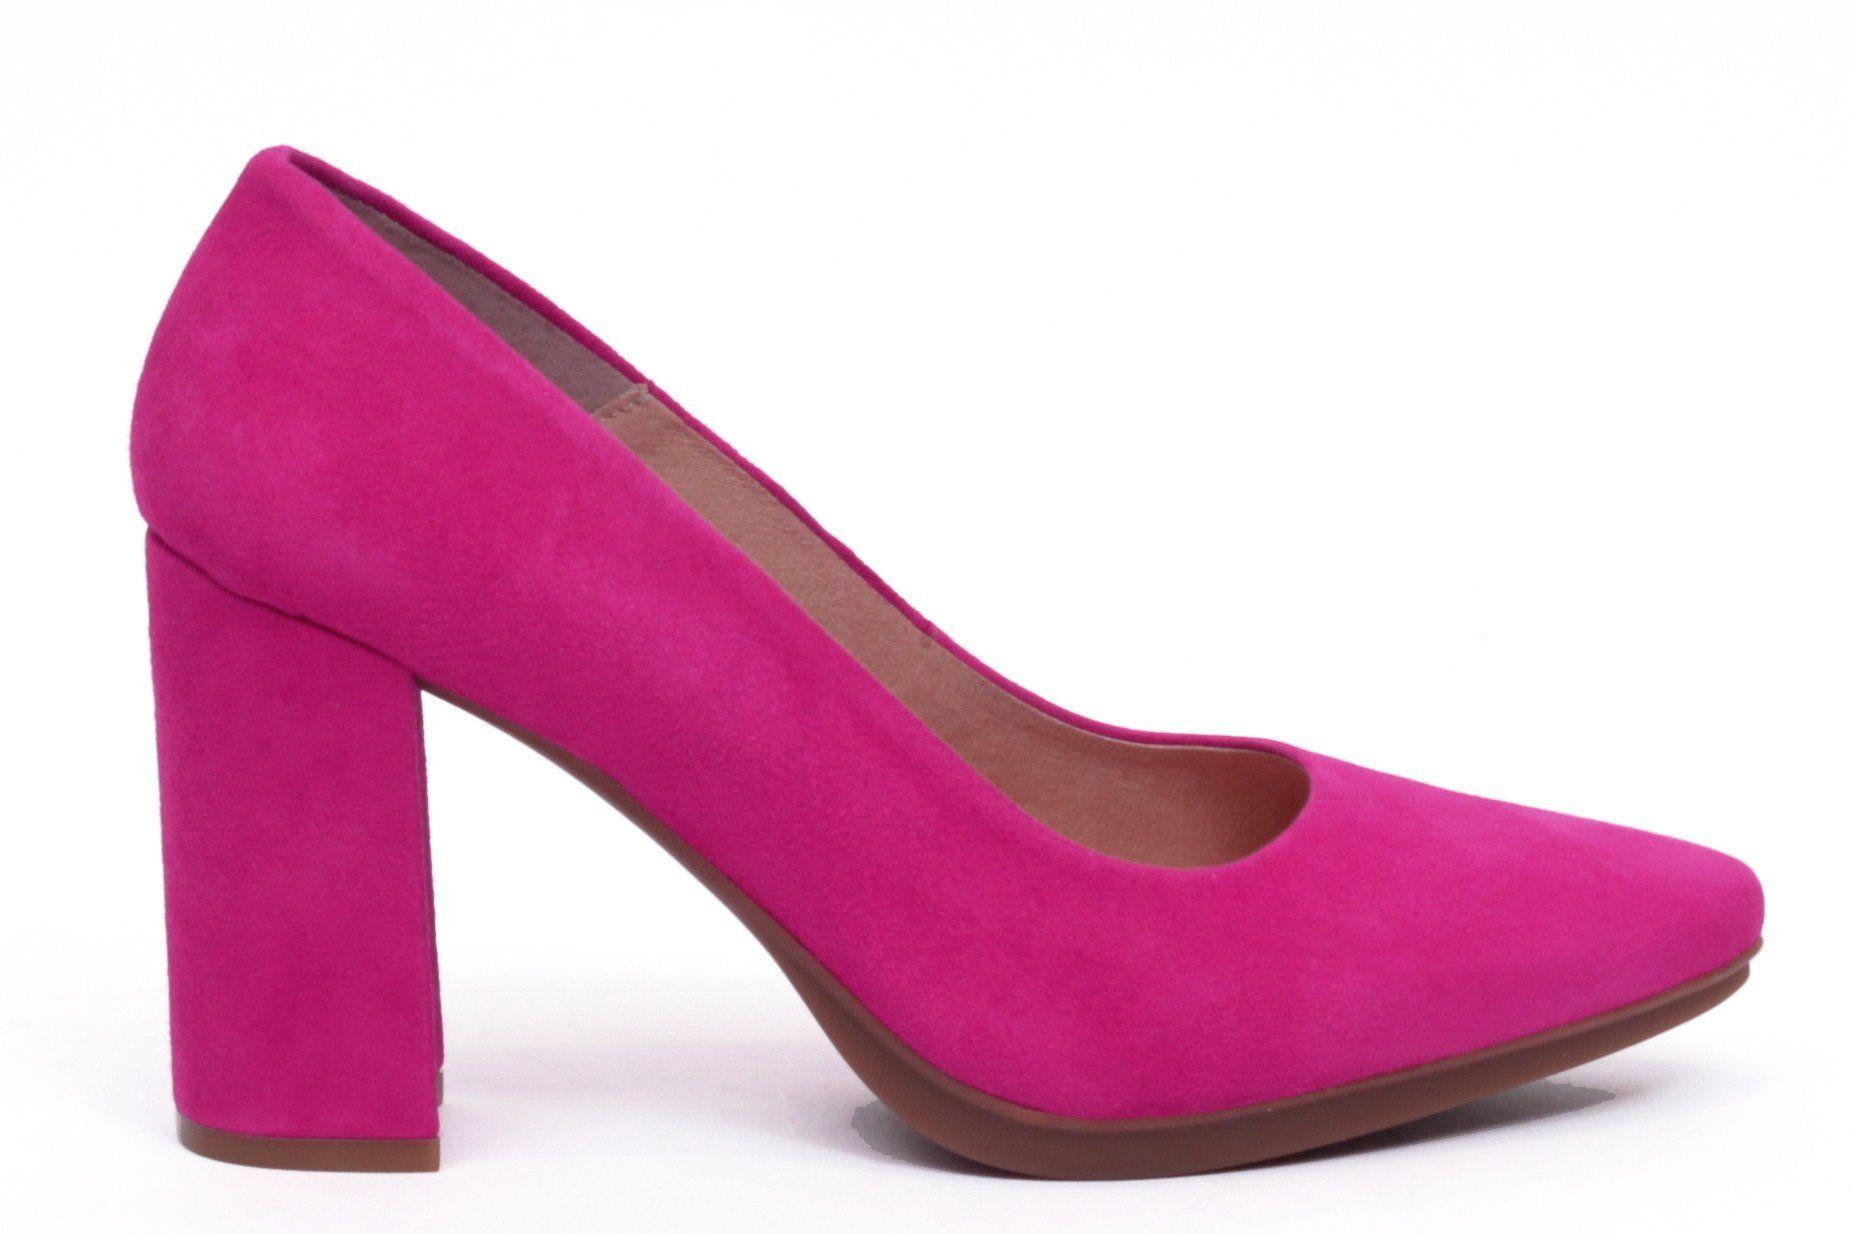 d55beef462d7f miMaO Urban S Rosa clavel –Zapato mujer de tacon salones vestir cómodo  maquillaje - women high heels shoes comfort pumps fuchsia pink